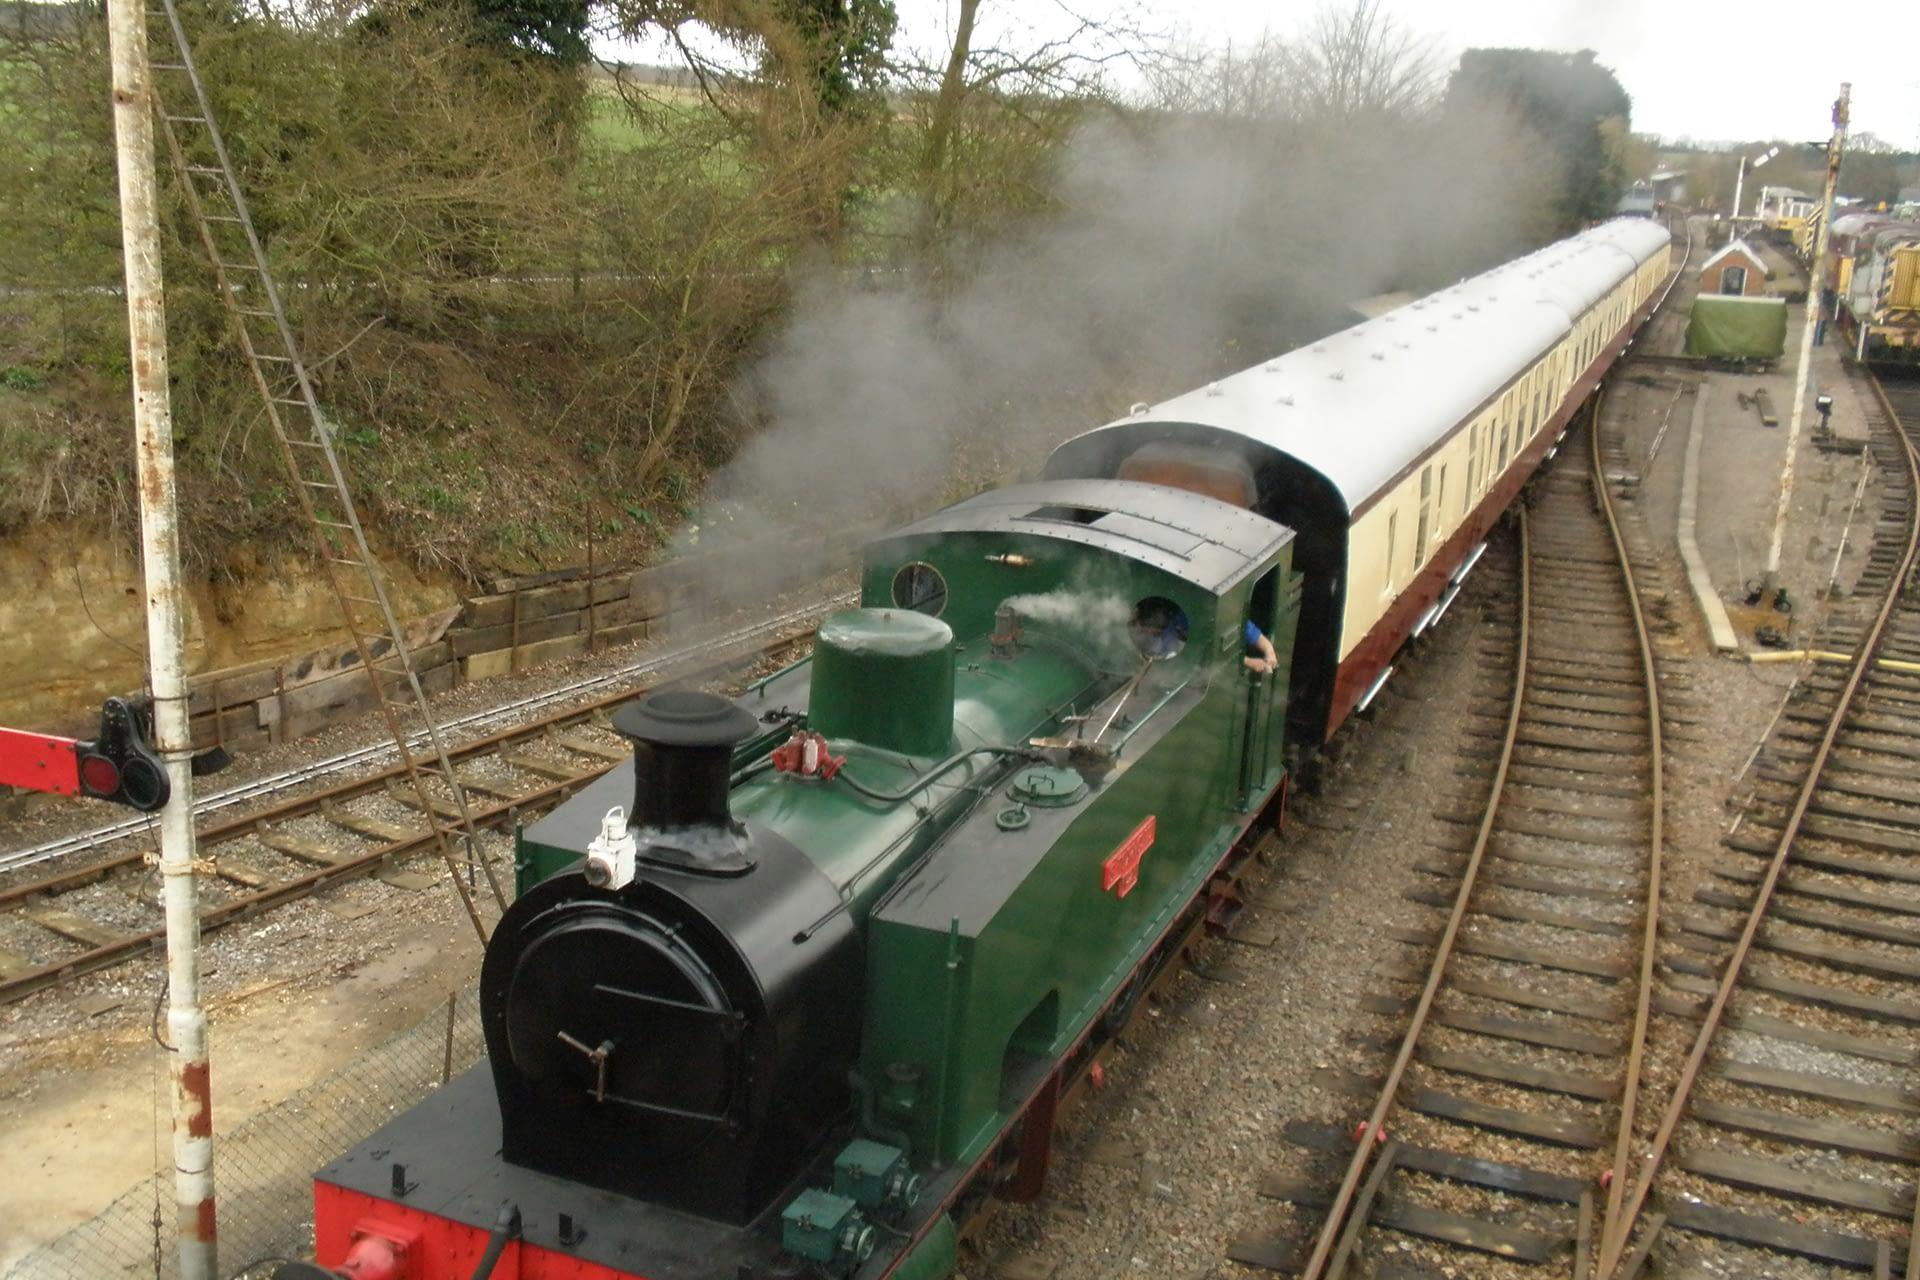 Colne Valley Railway Museum